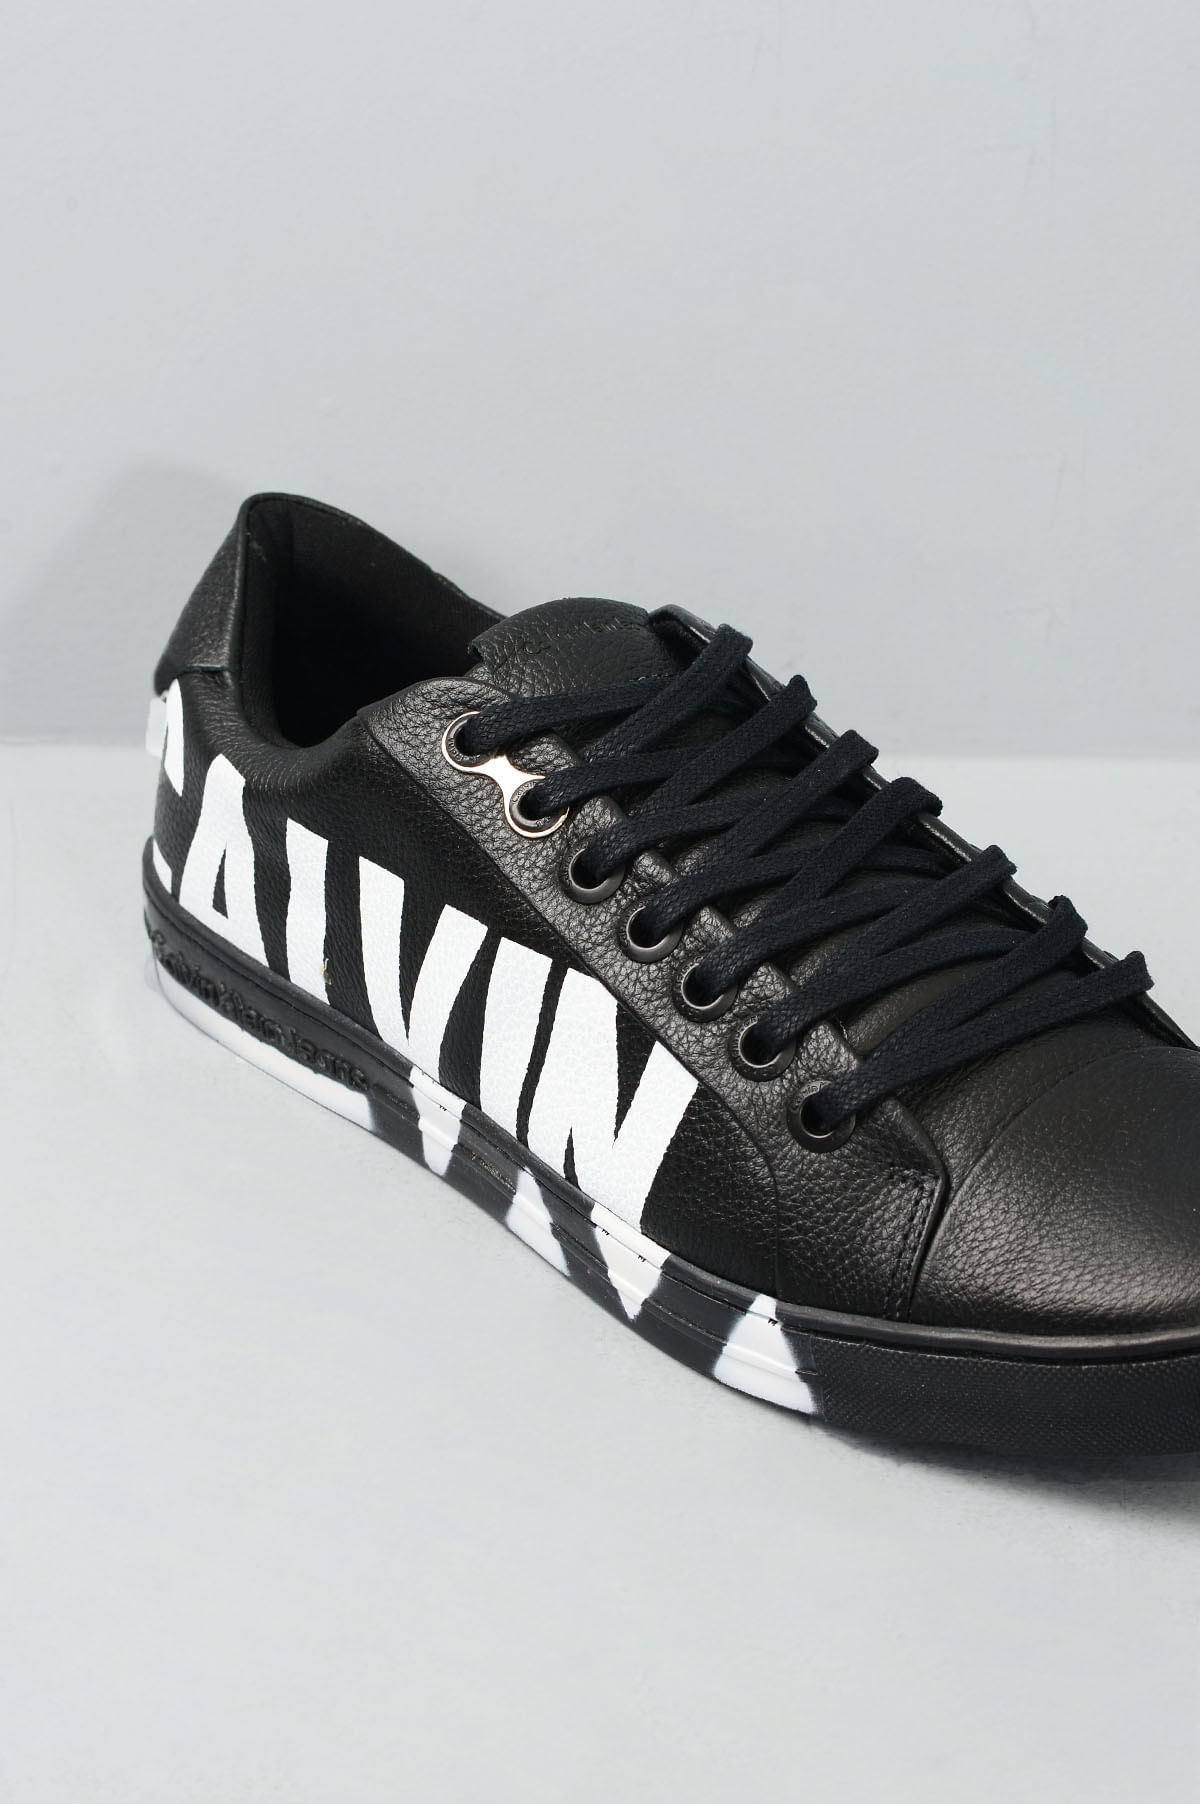 Sapatênis Masculino Calvin Klein Pedro CR-PRETO - Mundial Calçados 8826cb5373